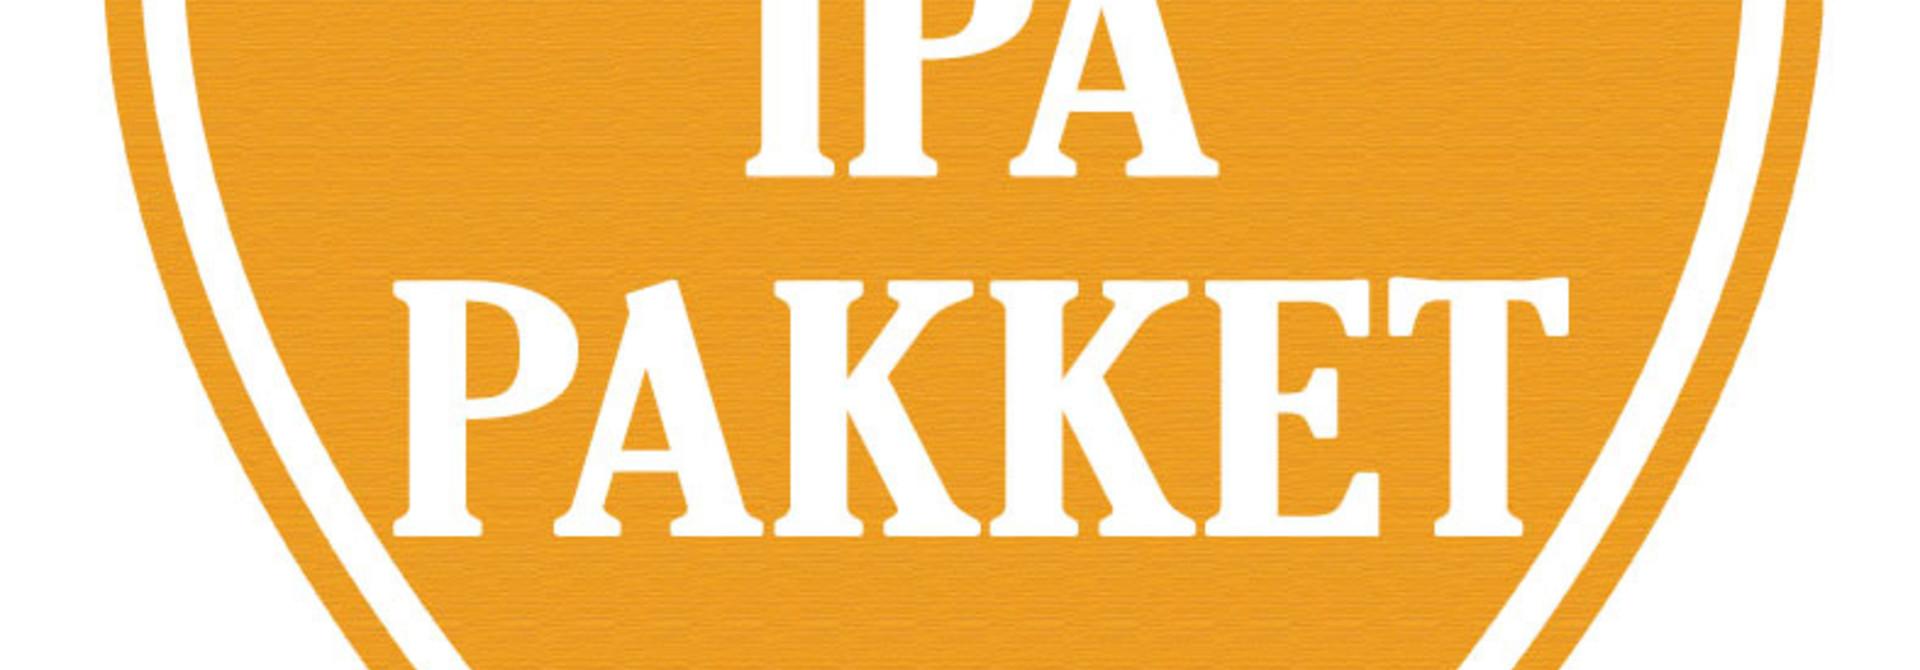 Hellobier IPA Bierpakket